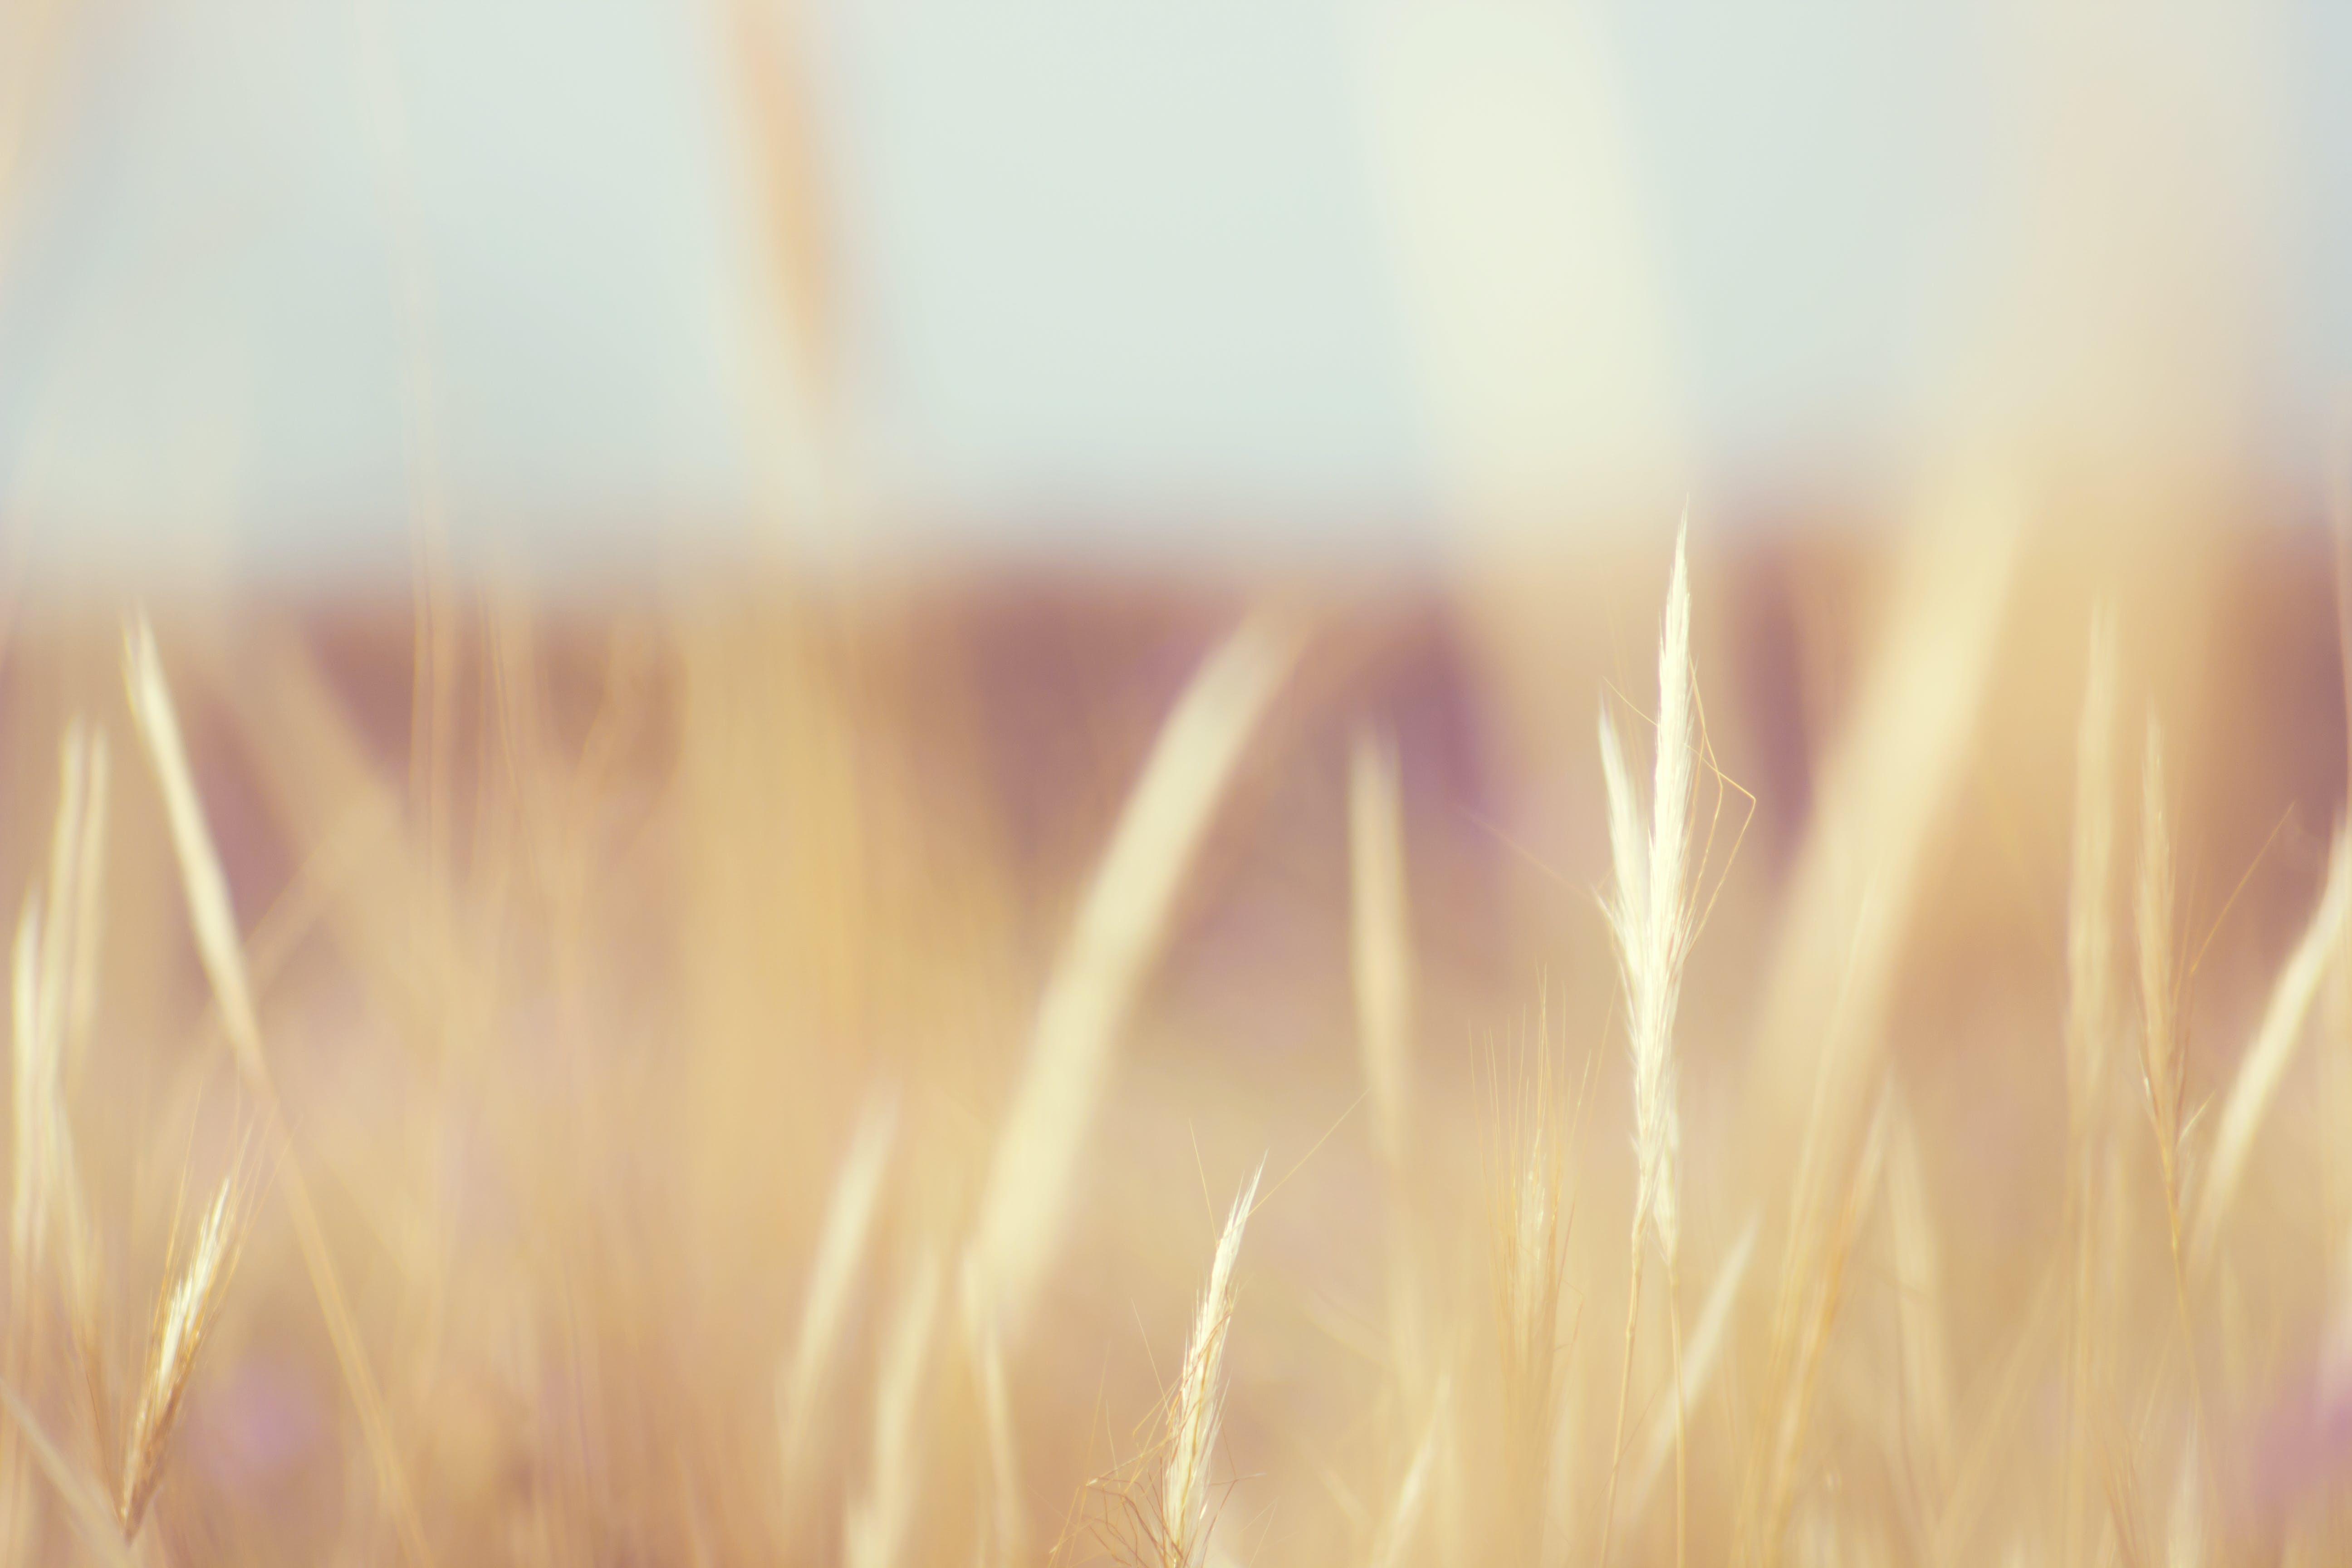 Selective Focus of Green Grass